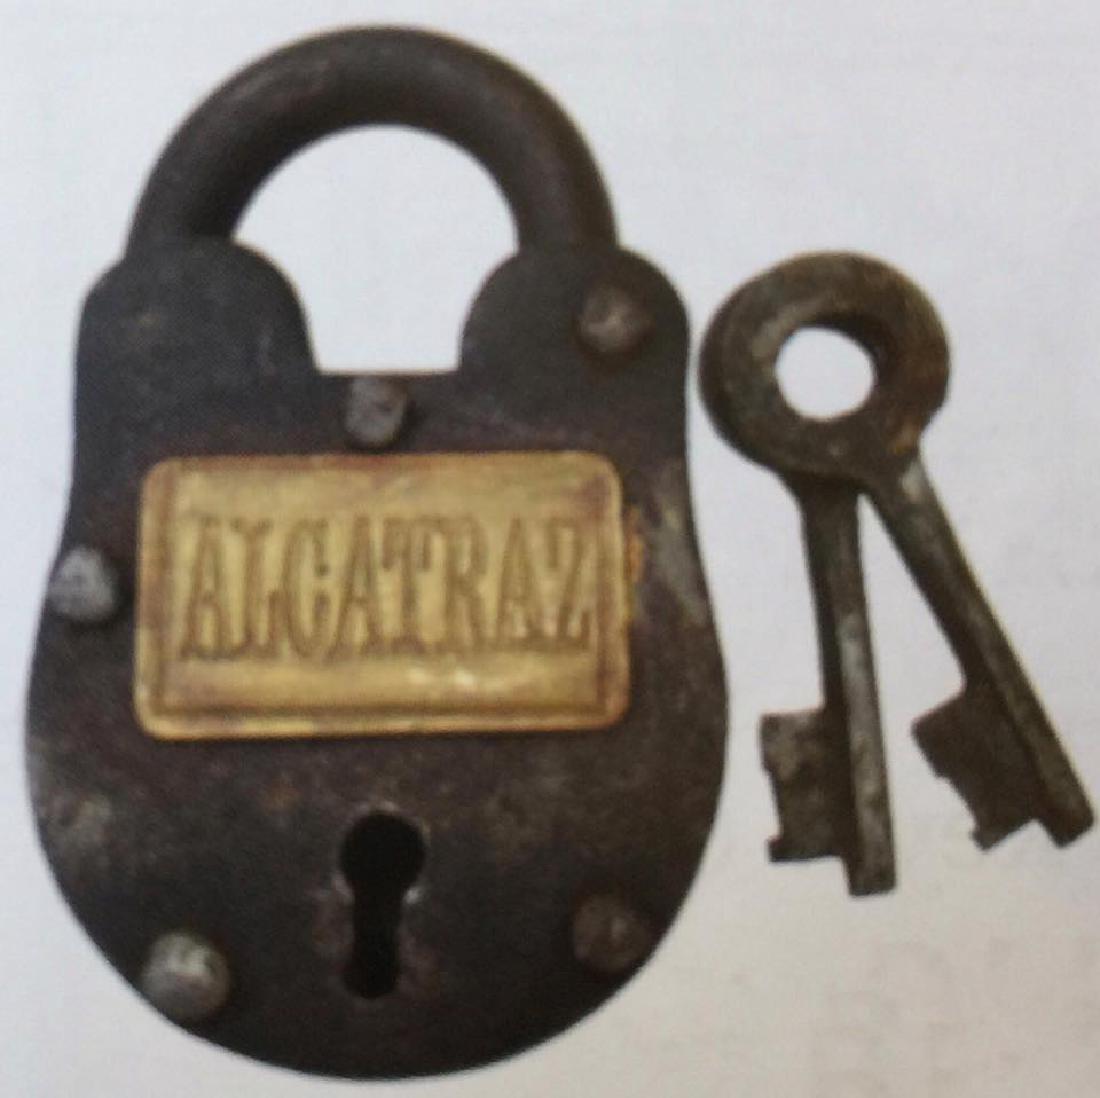 "ALCATRAZ CAST IRON GATE PADLOCK - 2.5"" X 1.5"""